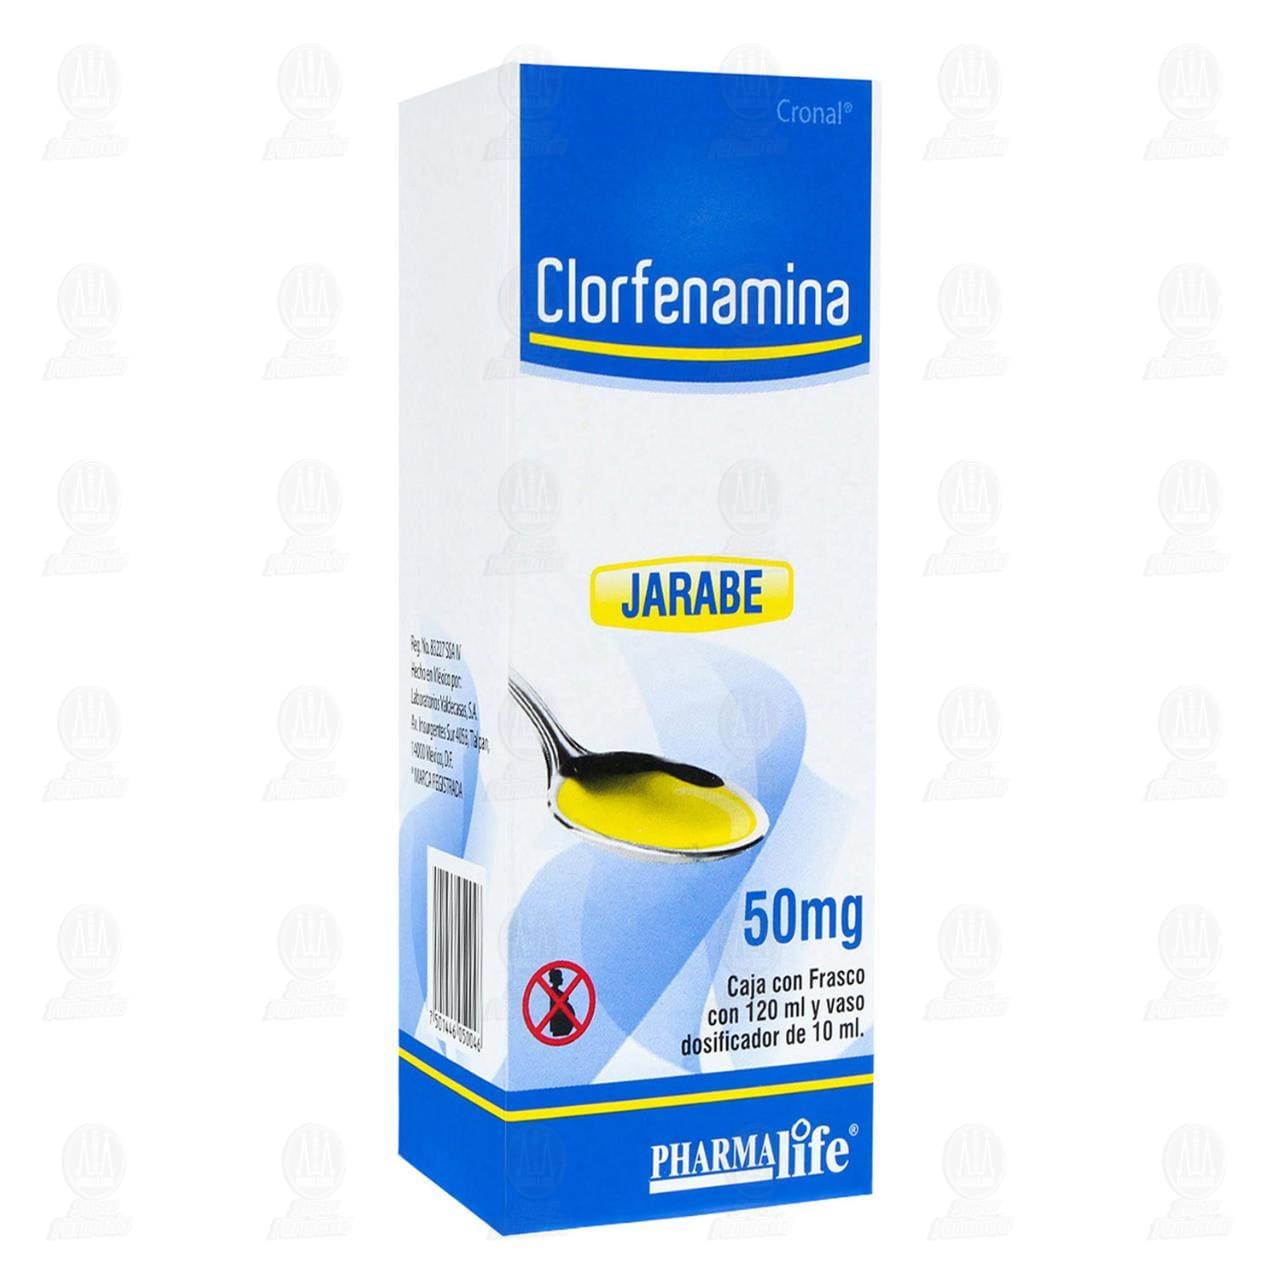 Comprar Clorfenamina 50mg 120ml Jarabe Pharmalife en Farmacias Guadalajara